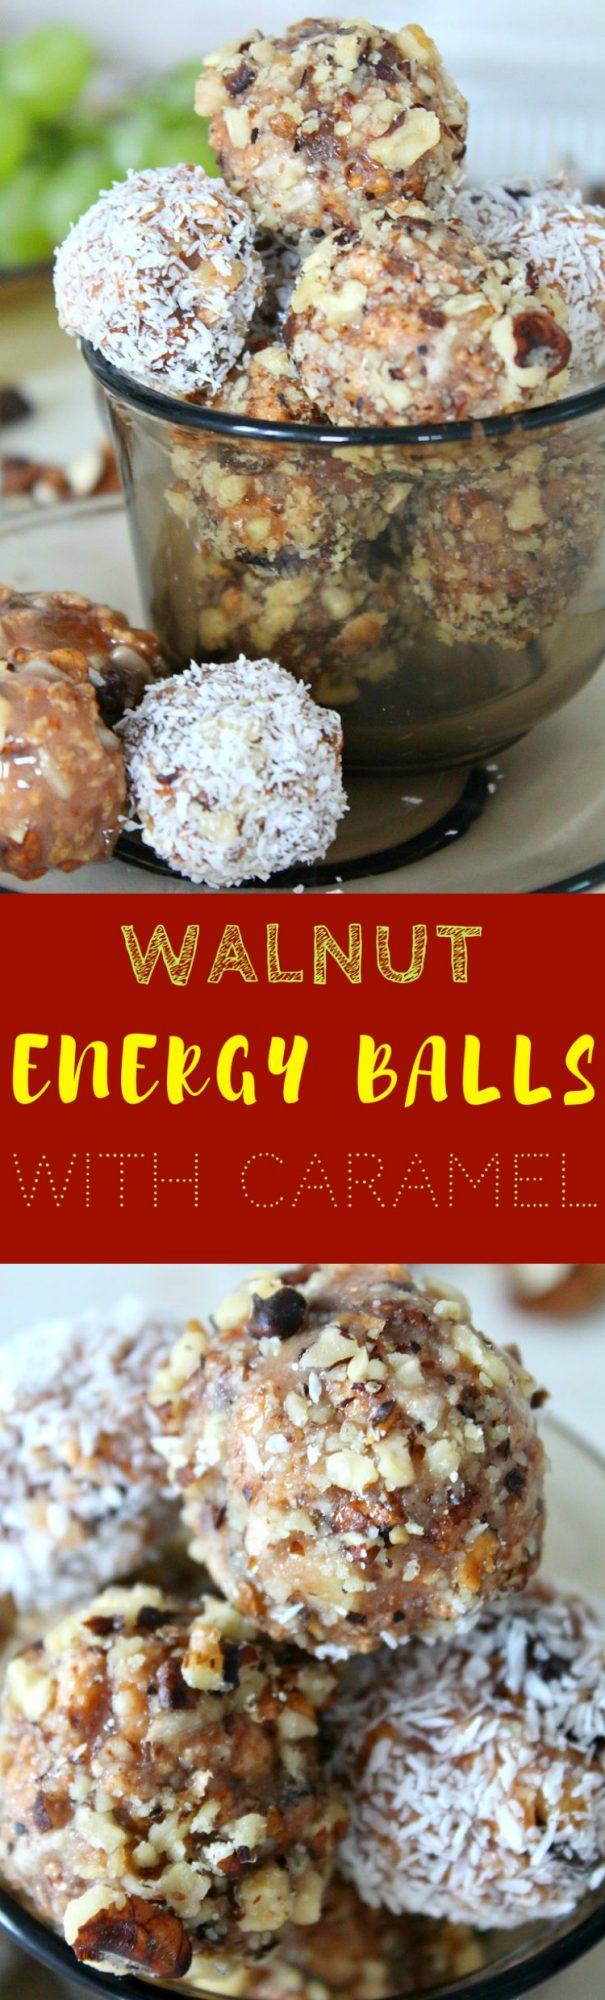 Nut balls recipe